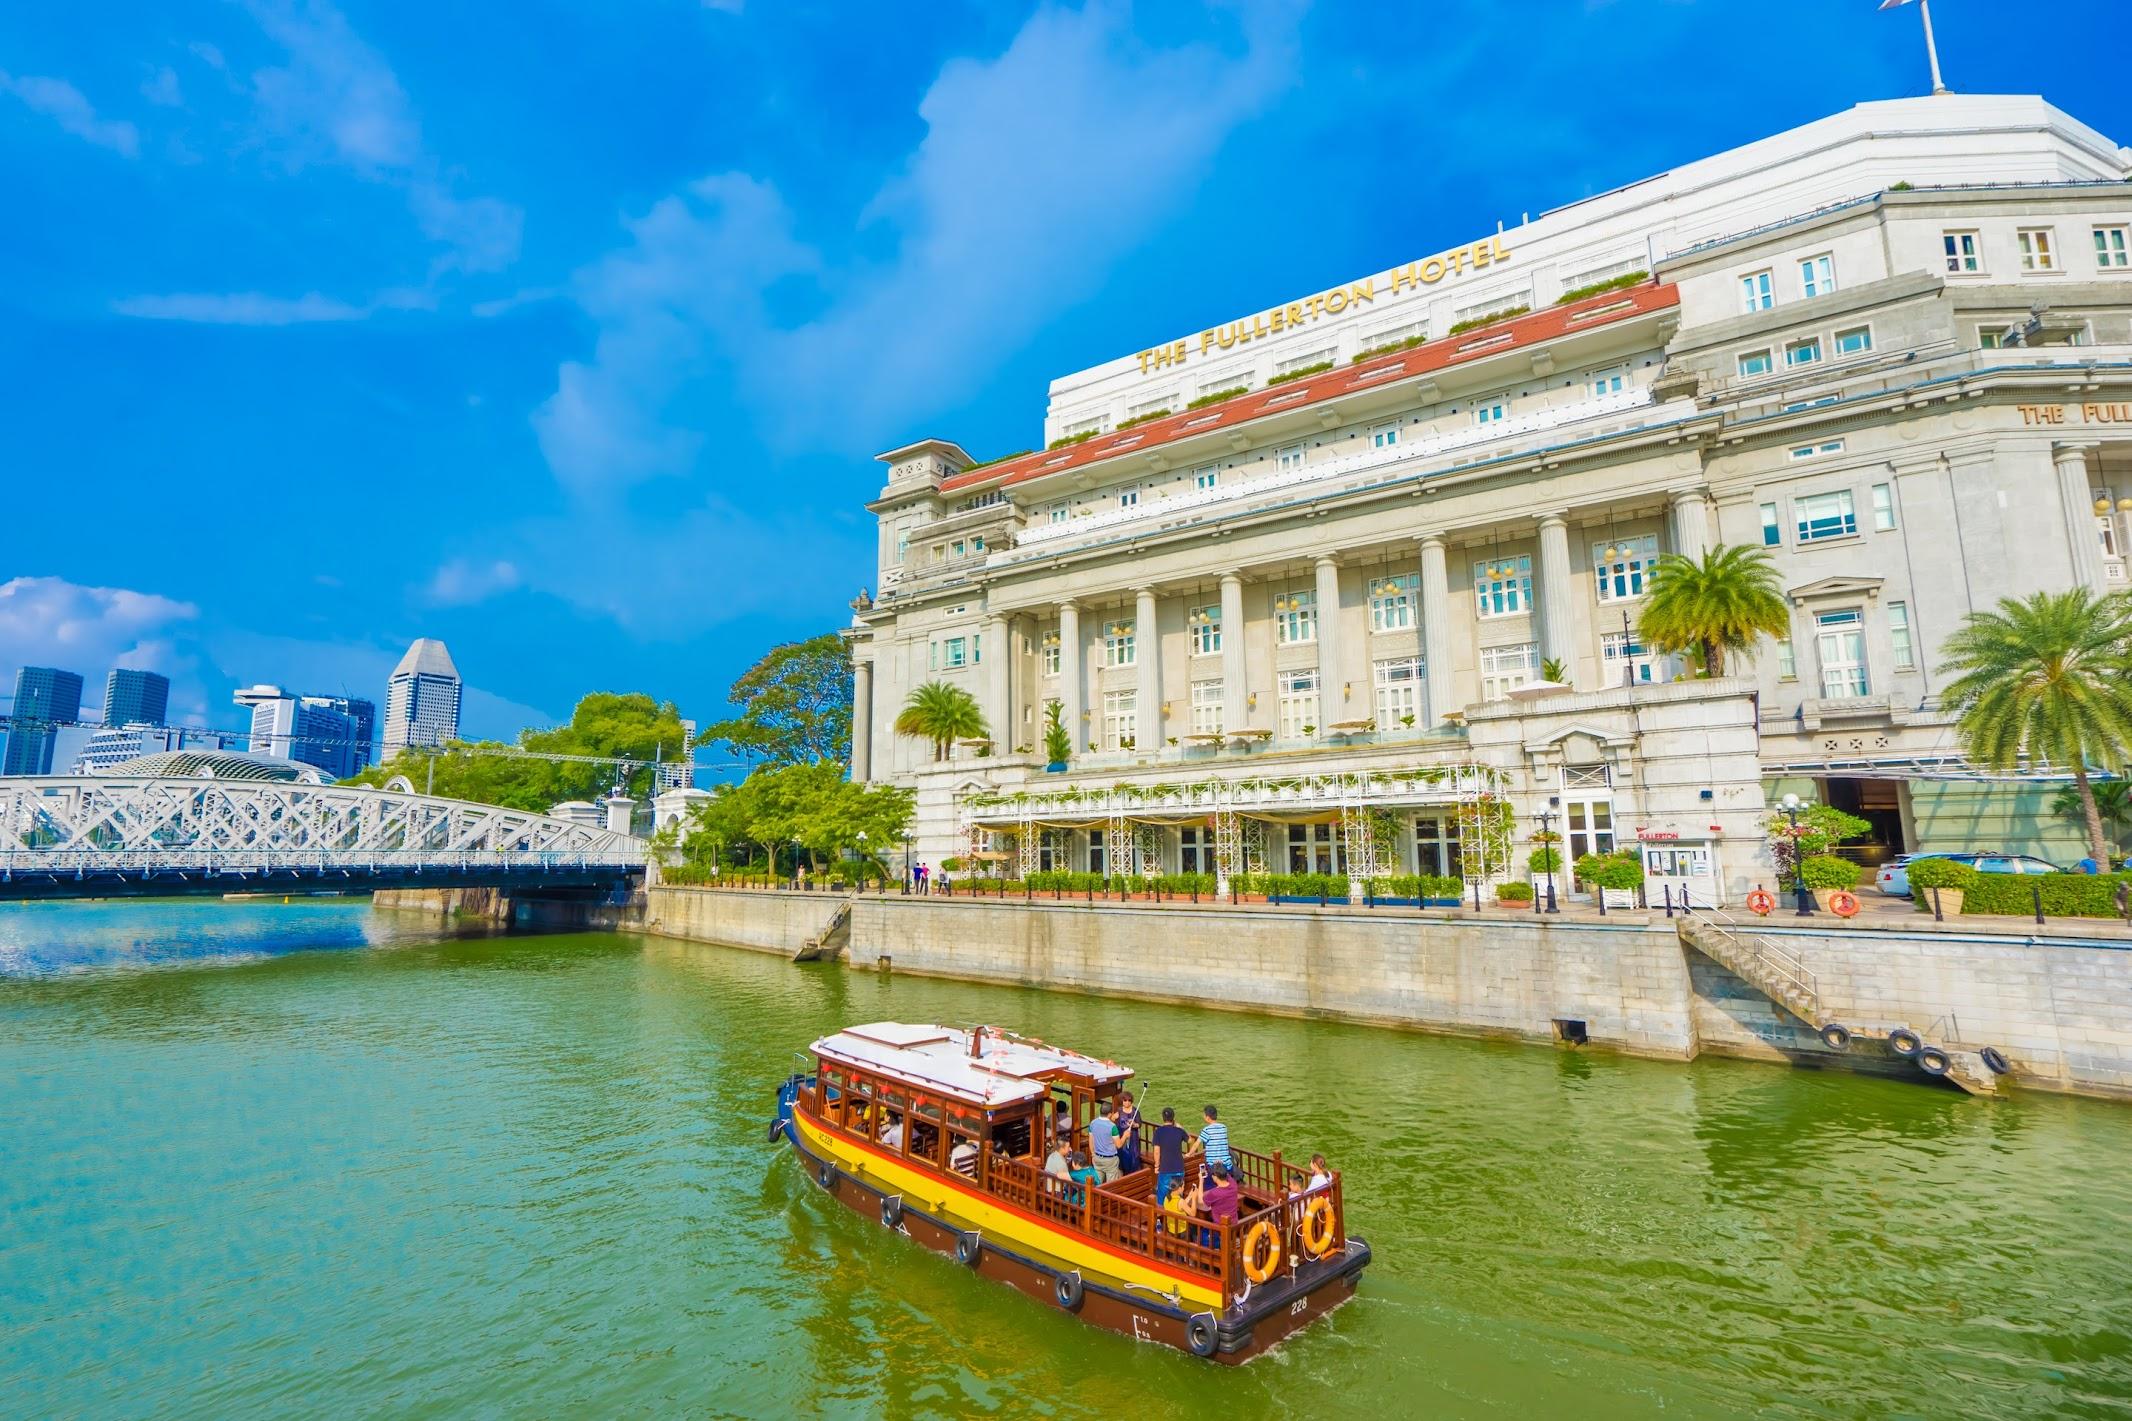 Singapore Fullerton Hotel River Cruise1